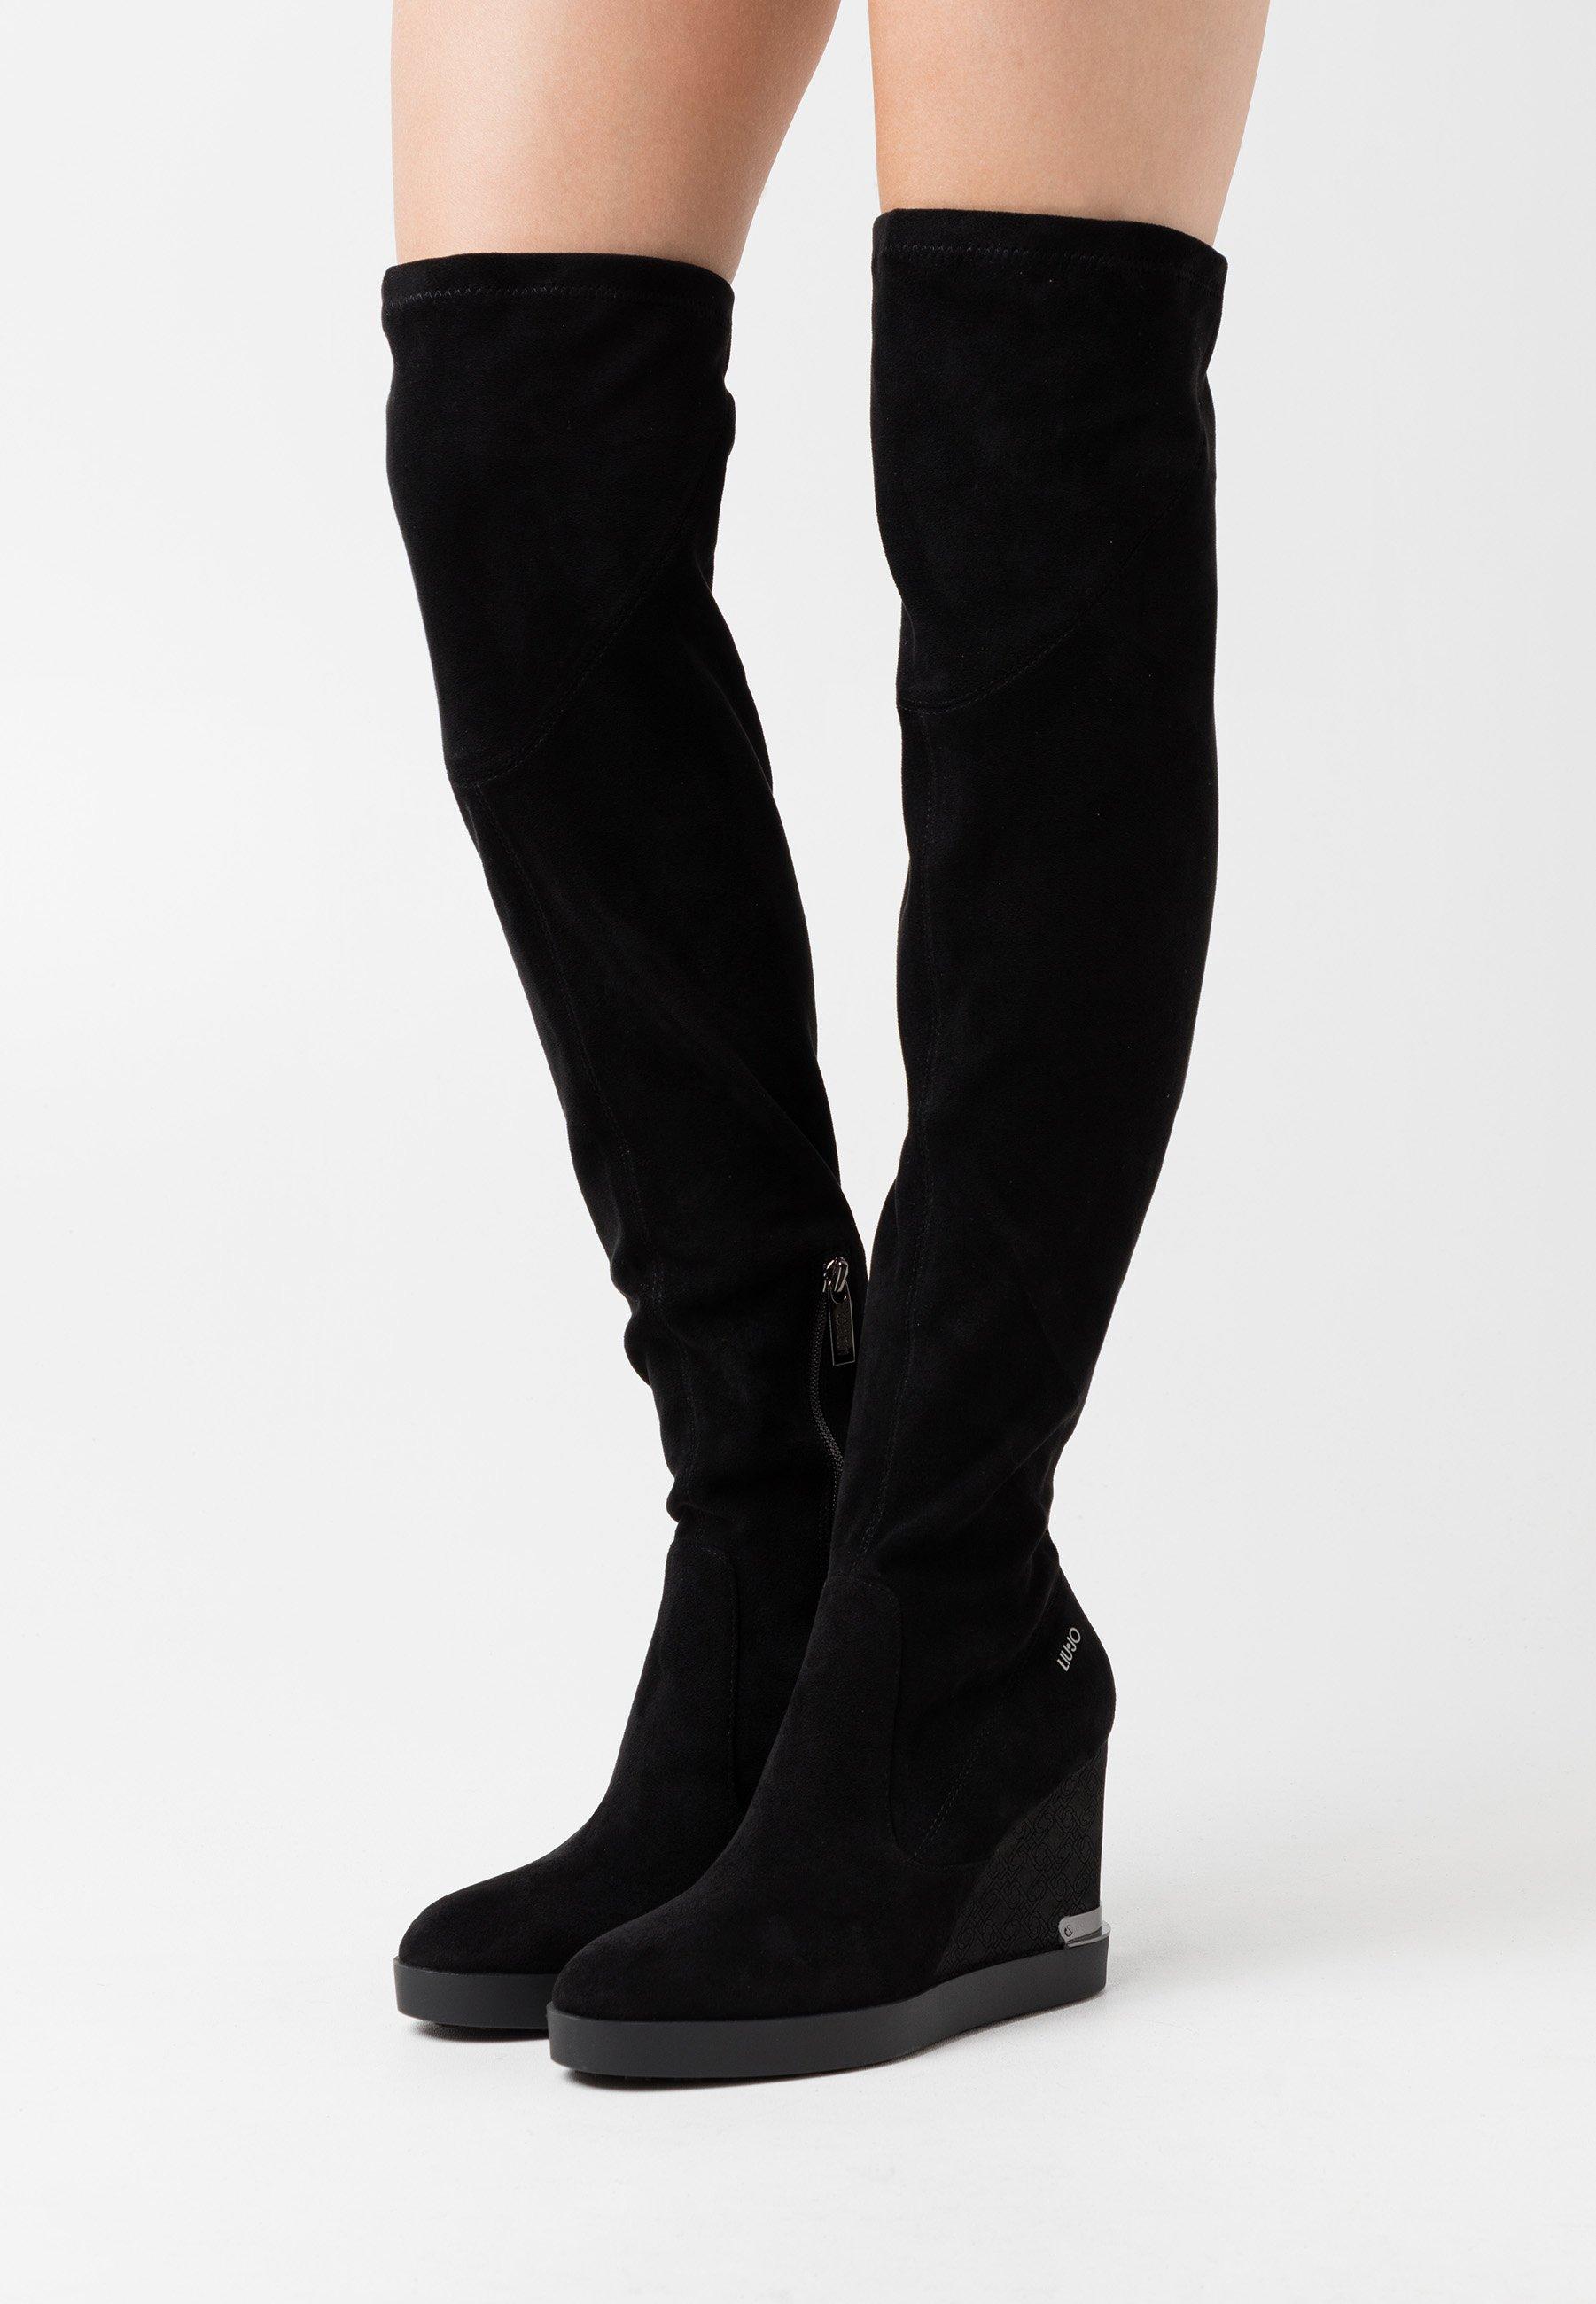 diario dar a entender Erudito  Liu Jo Jeans GLEN - Over-the-knee boots - black - Zalando.co.uk